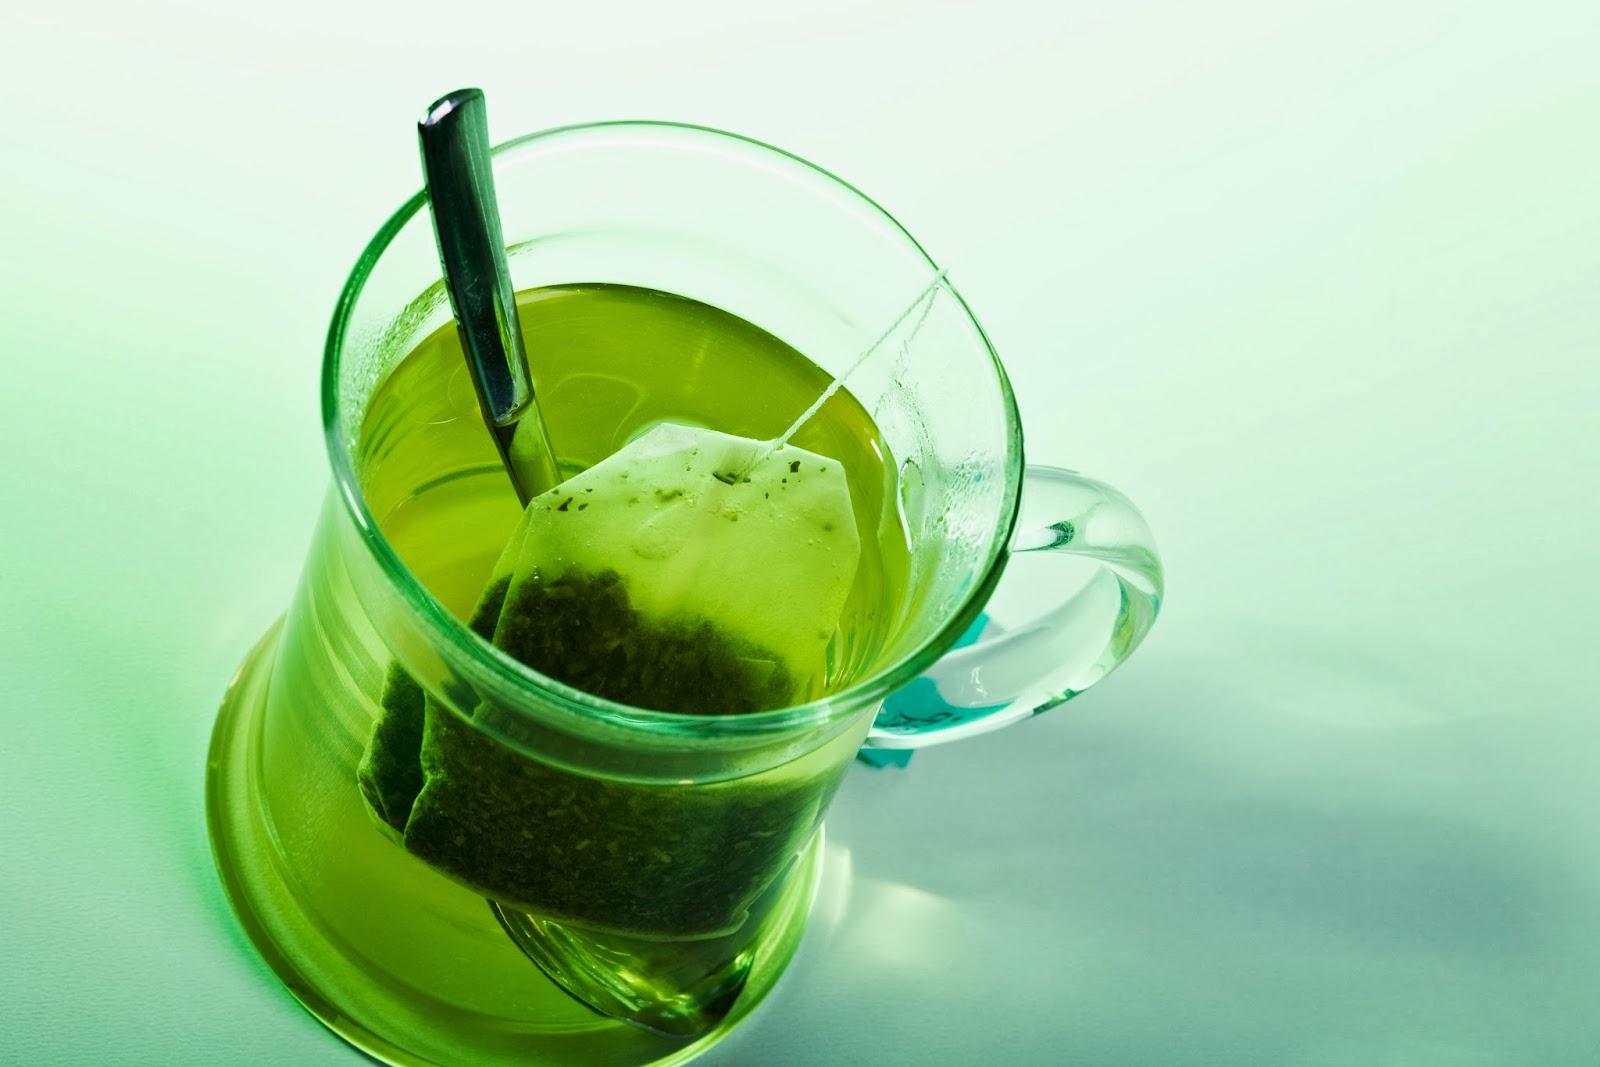 Ceaiul acesta face minuni! Uite cum reduci nicotina din organism